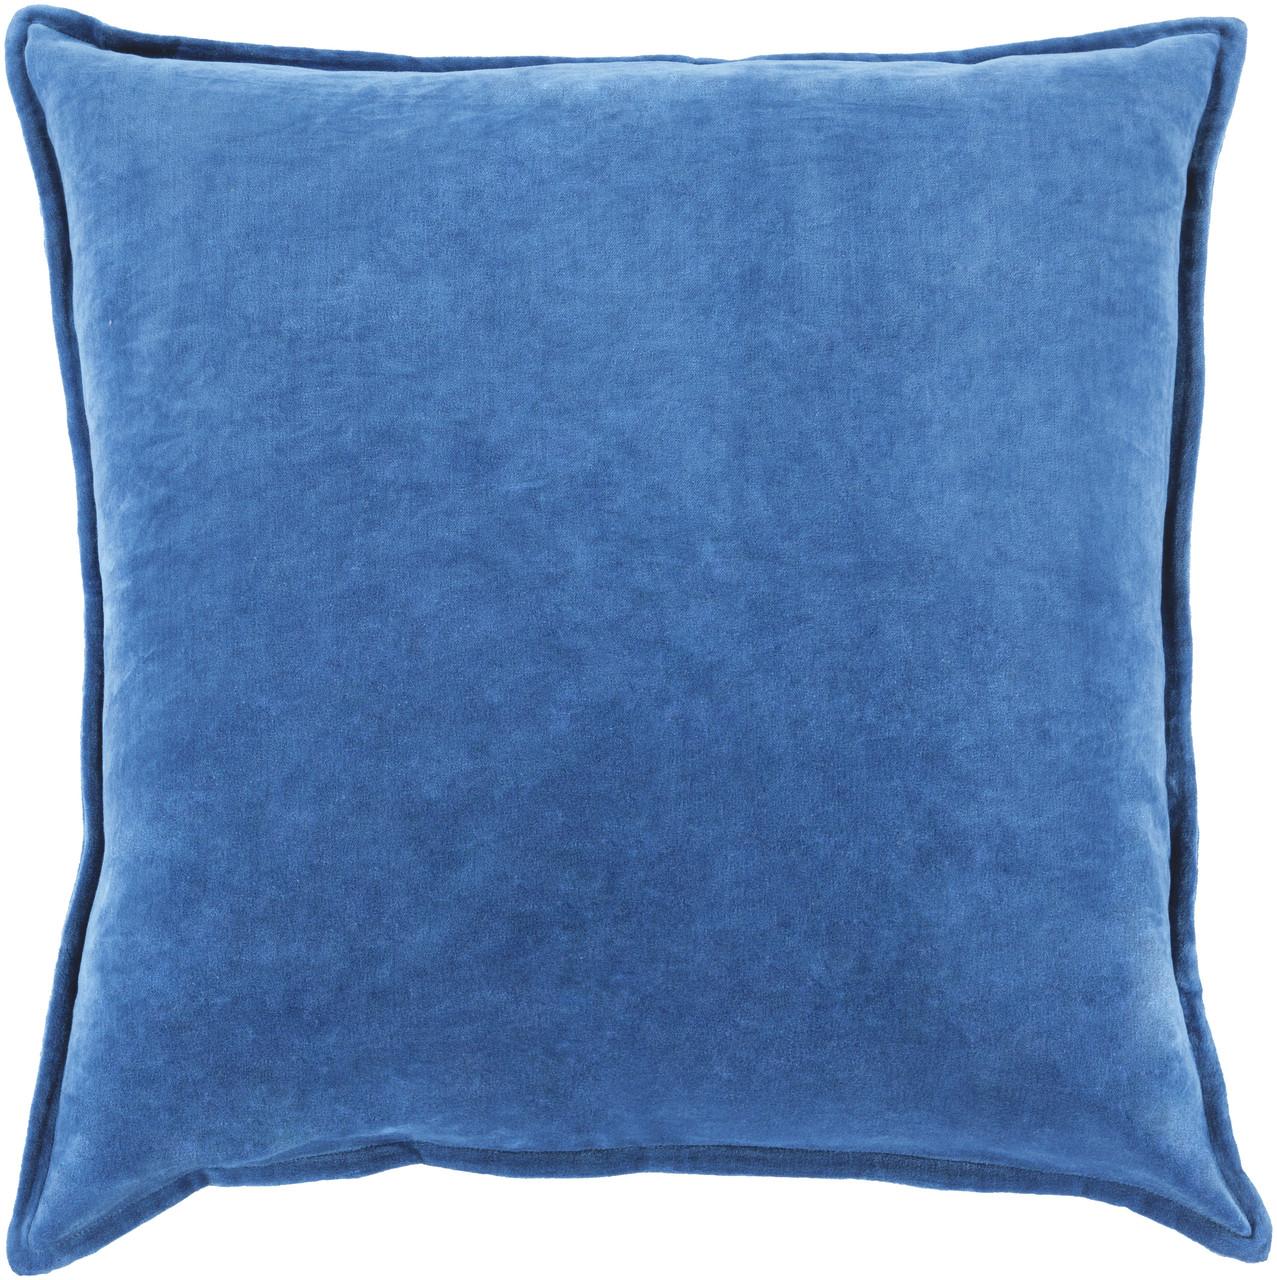 Throw Pillow Fillers : 22